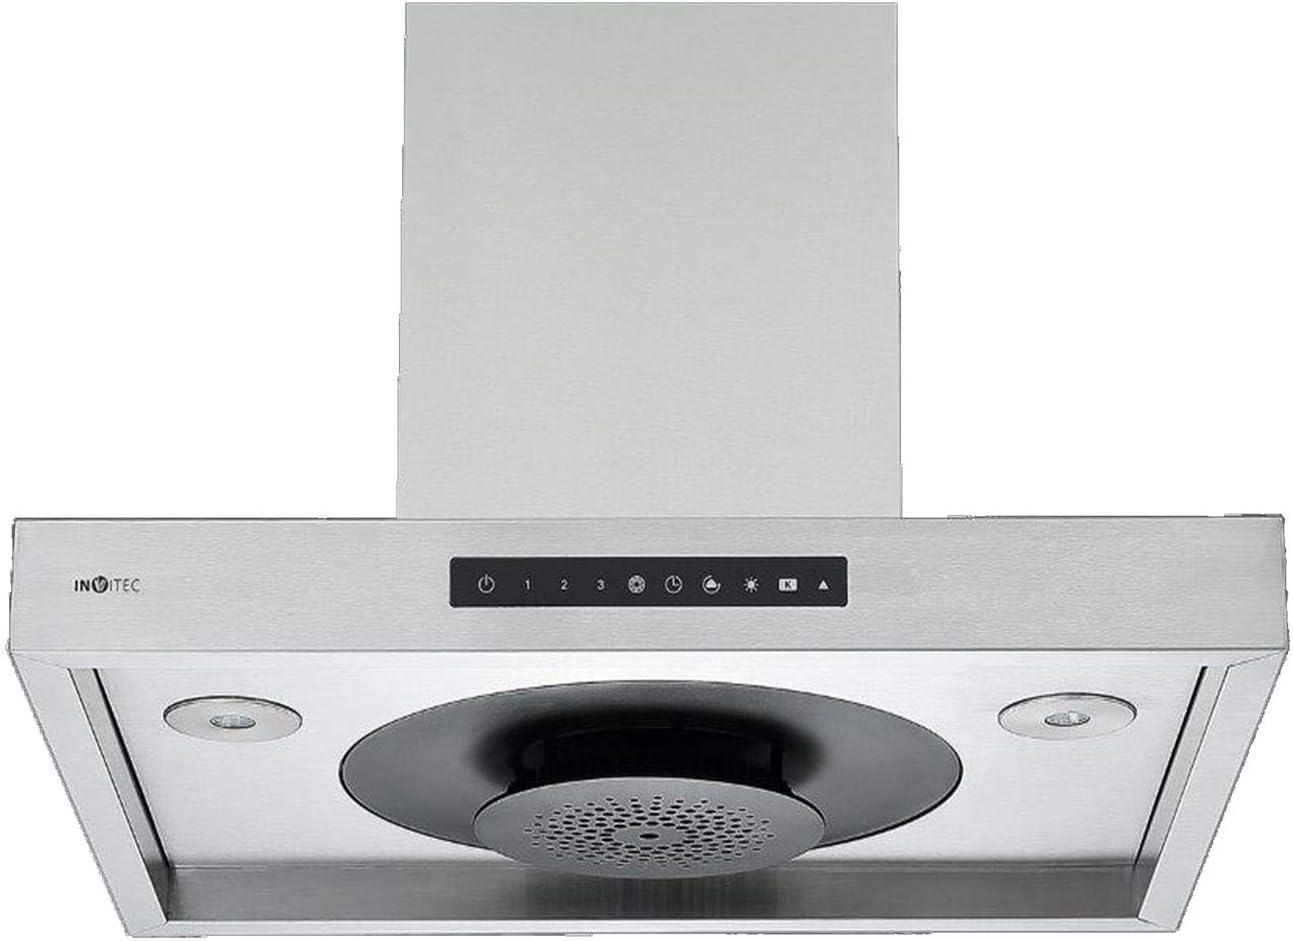 Invvitec Touch Eco-Jet - Campana extractora de acero inoxidable (60 cm): Amazon.es: Grandes electrodomésticos